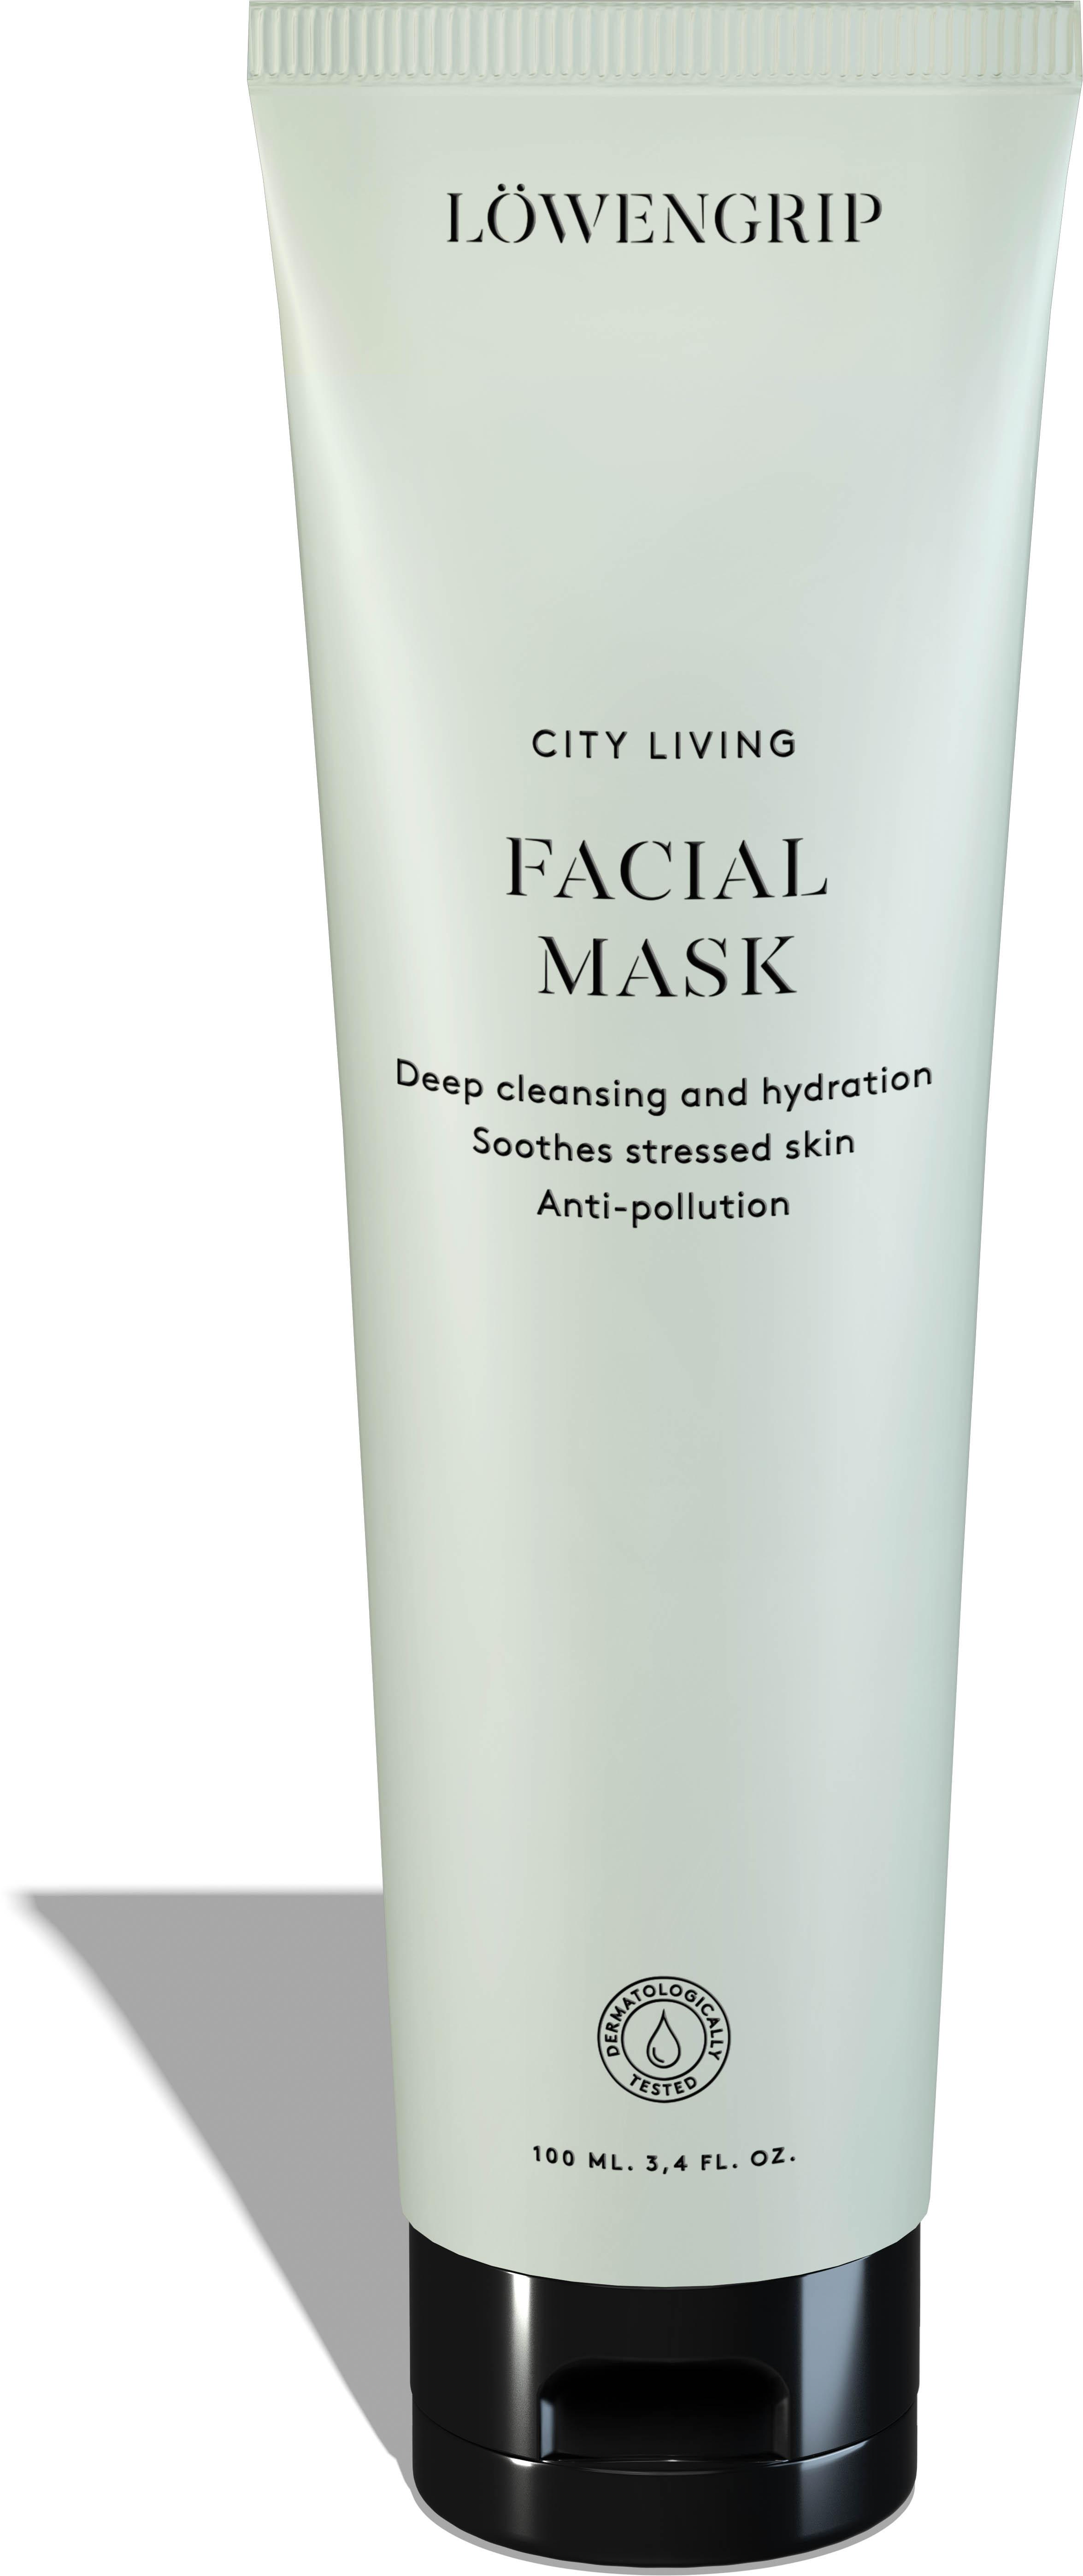 City Living - Facial Mask 100ml